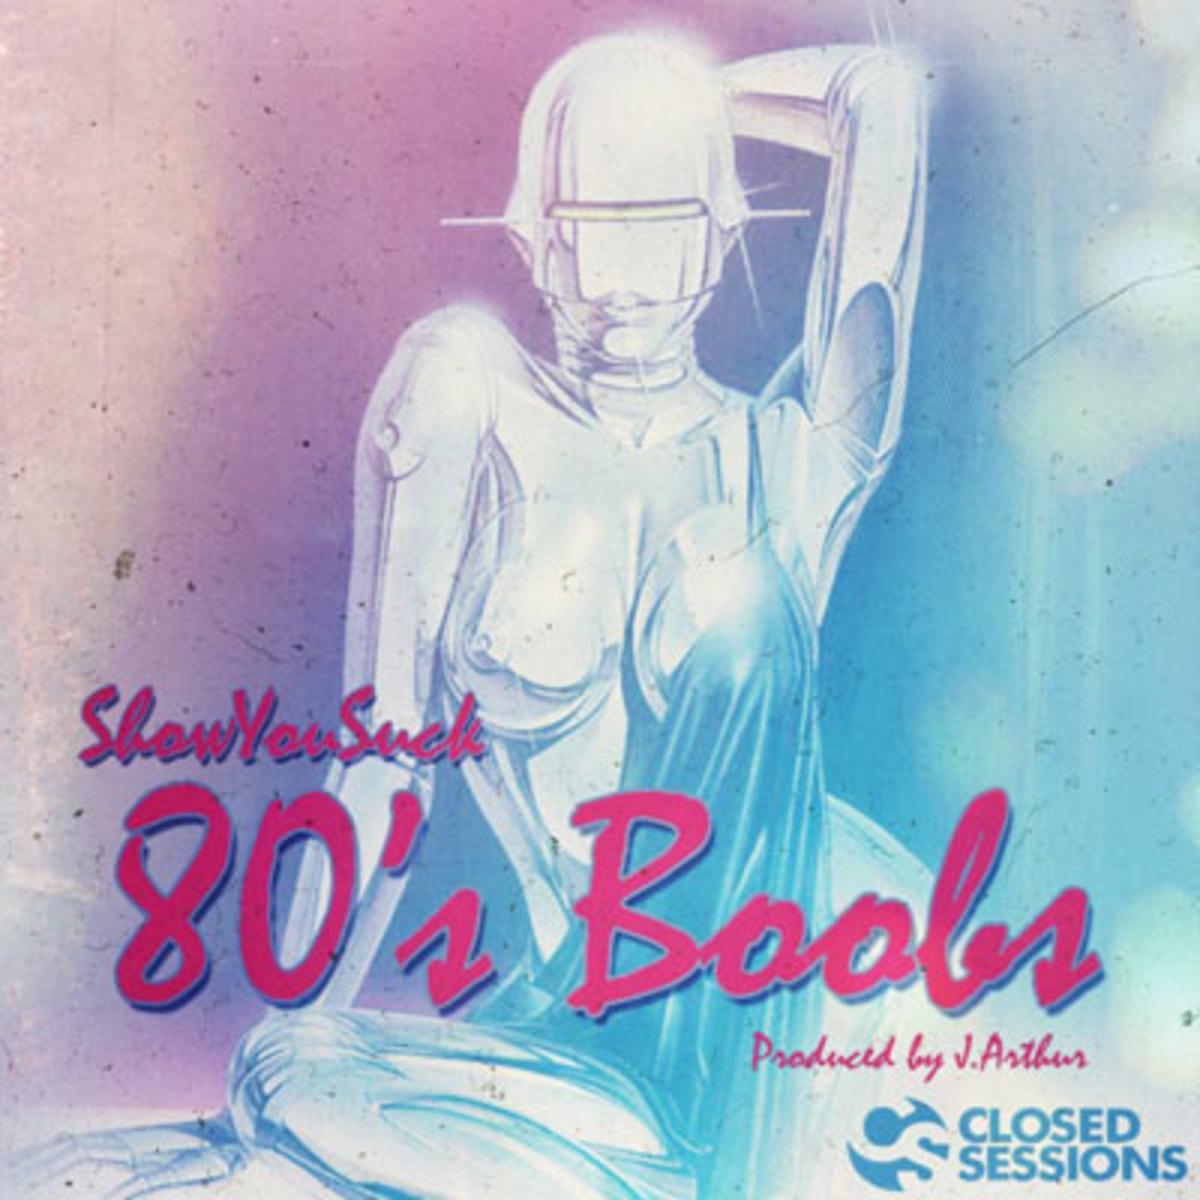 showyousuck-80sboobs.jpg